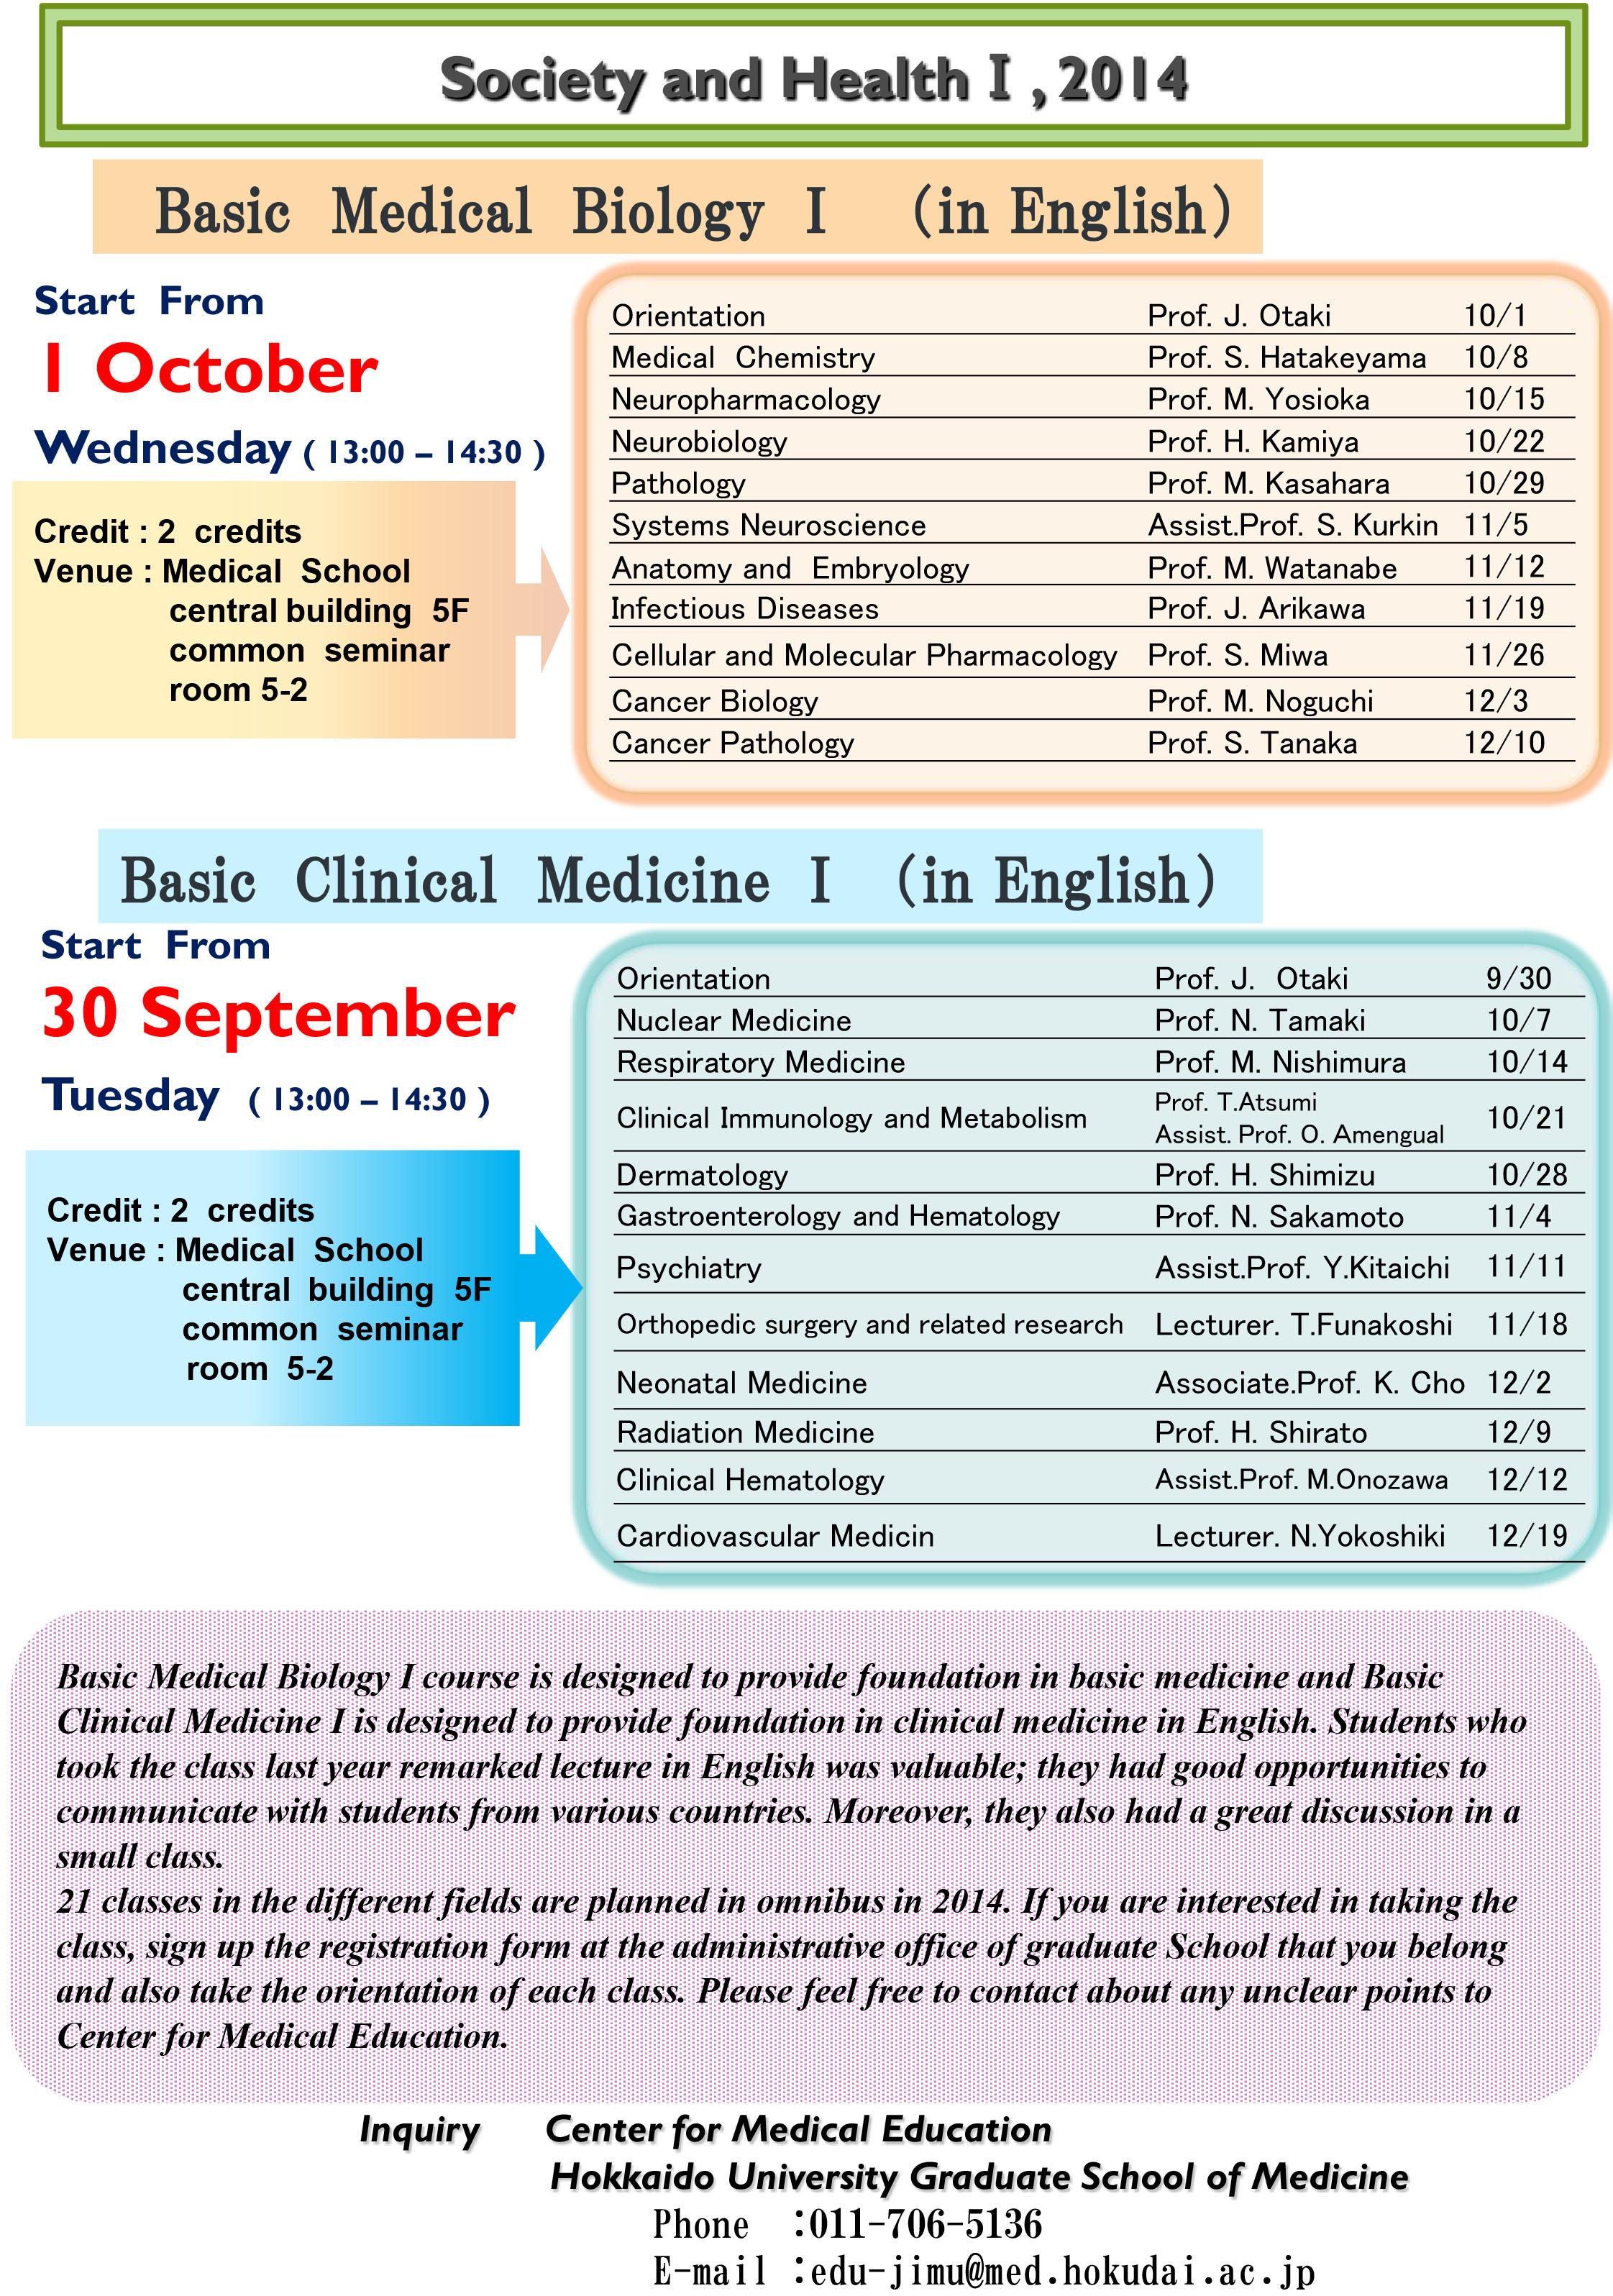 Important information about Common Graduate Courses